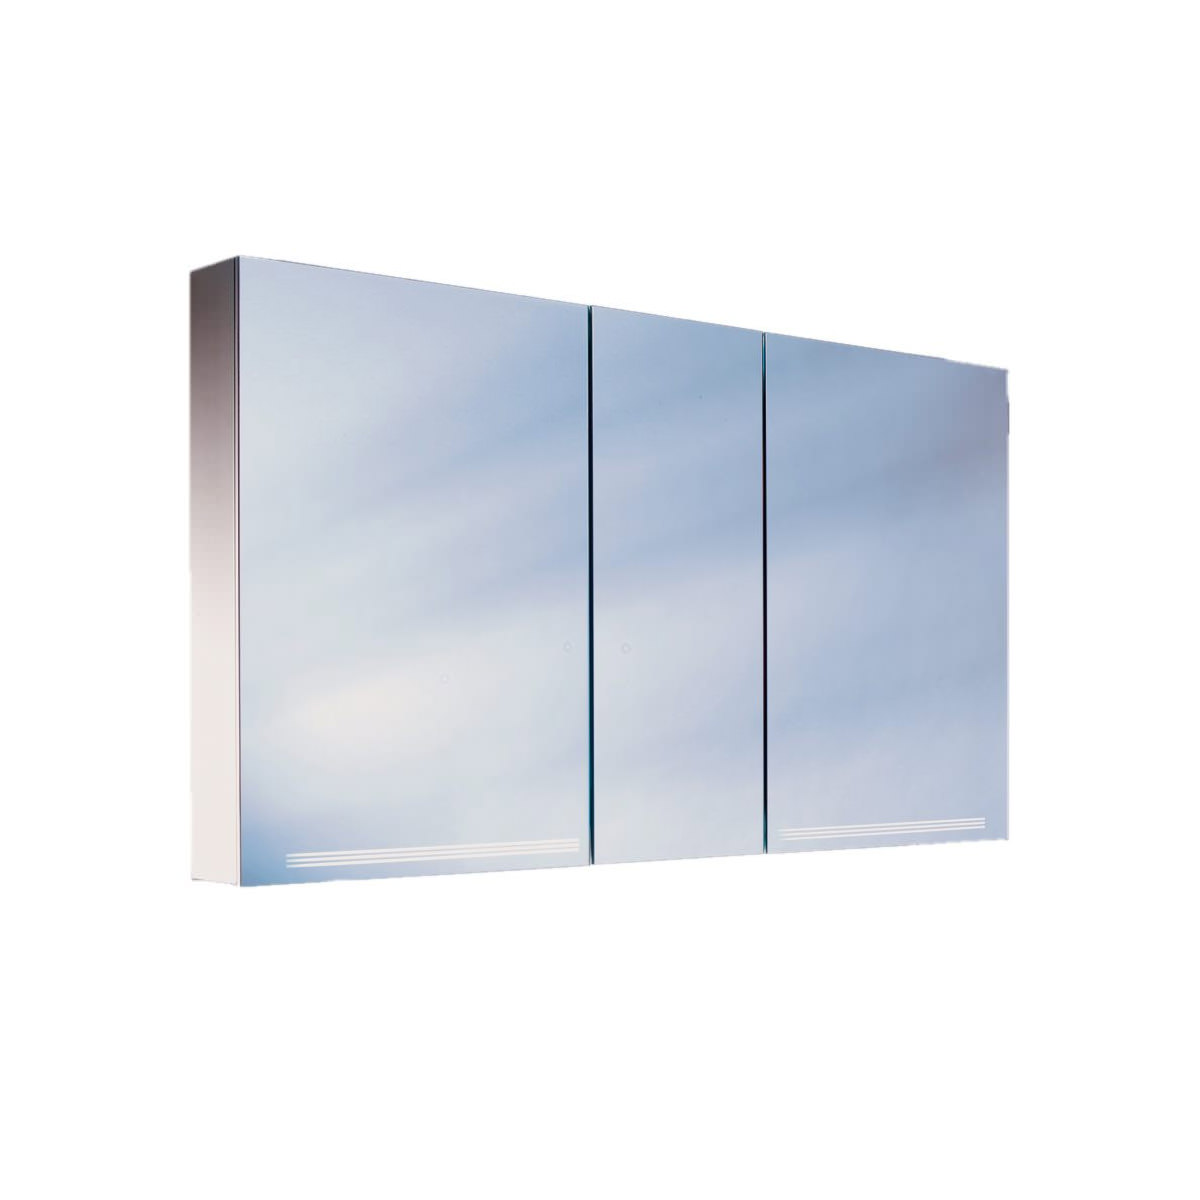 Schneider Graceline 3 Door Mirror Cabinet With Led Light Grl 1303